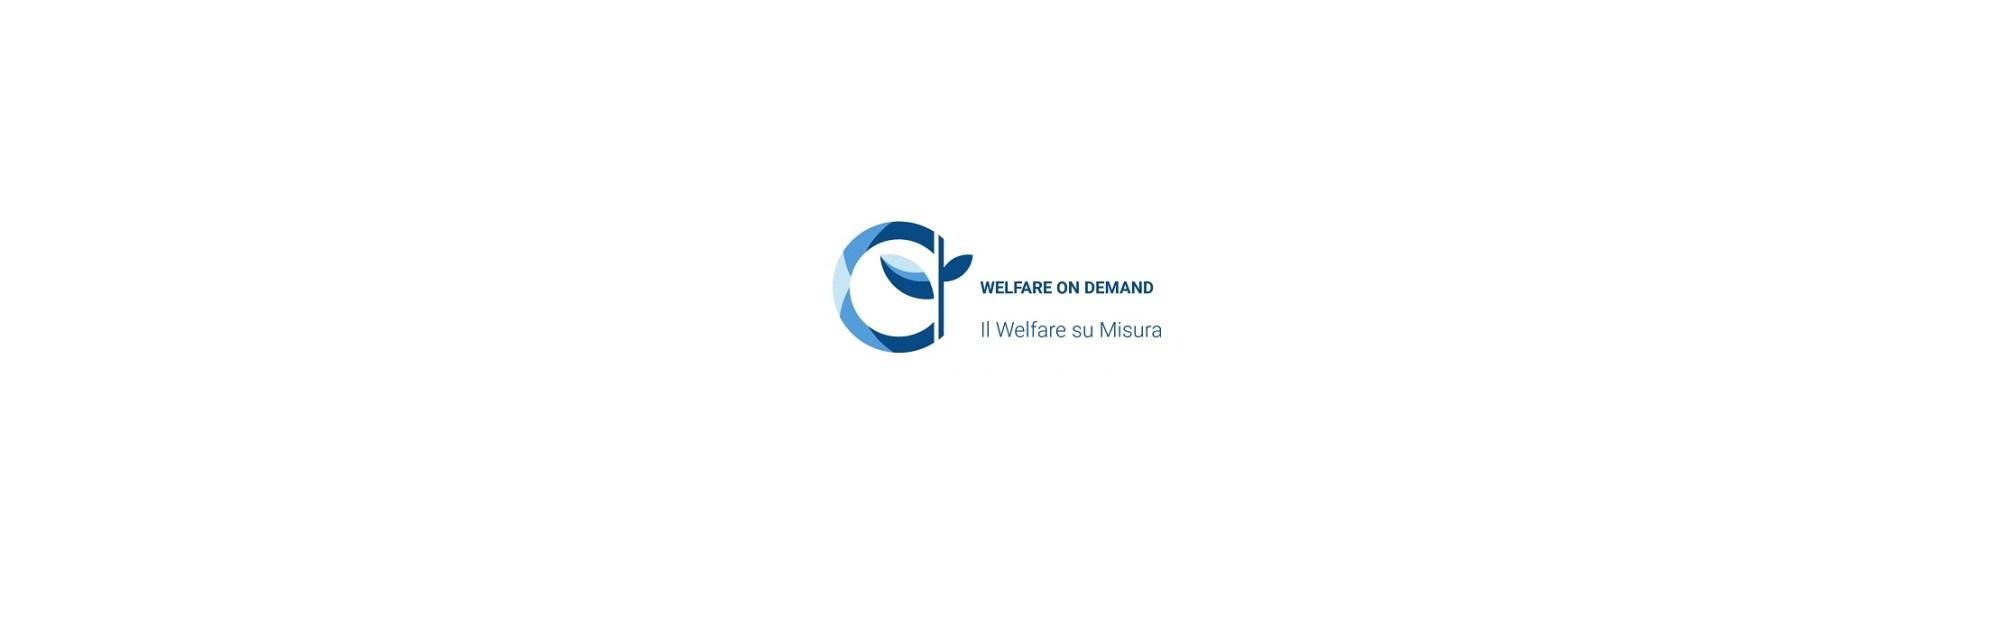 Welfare On Demand - logo